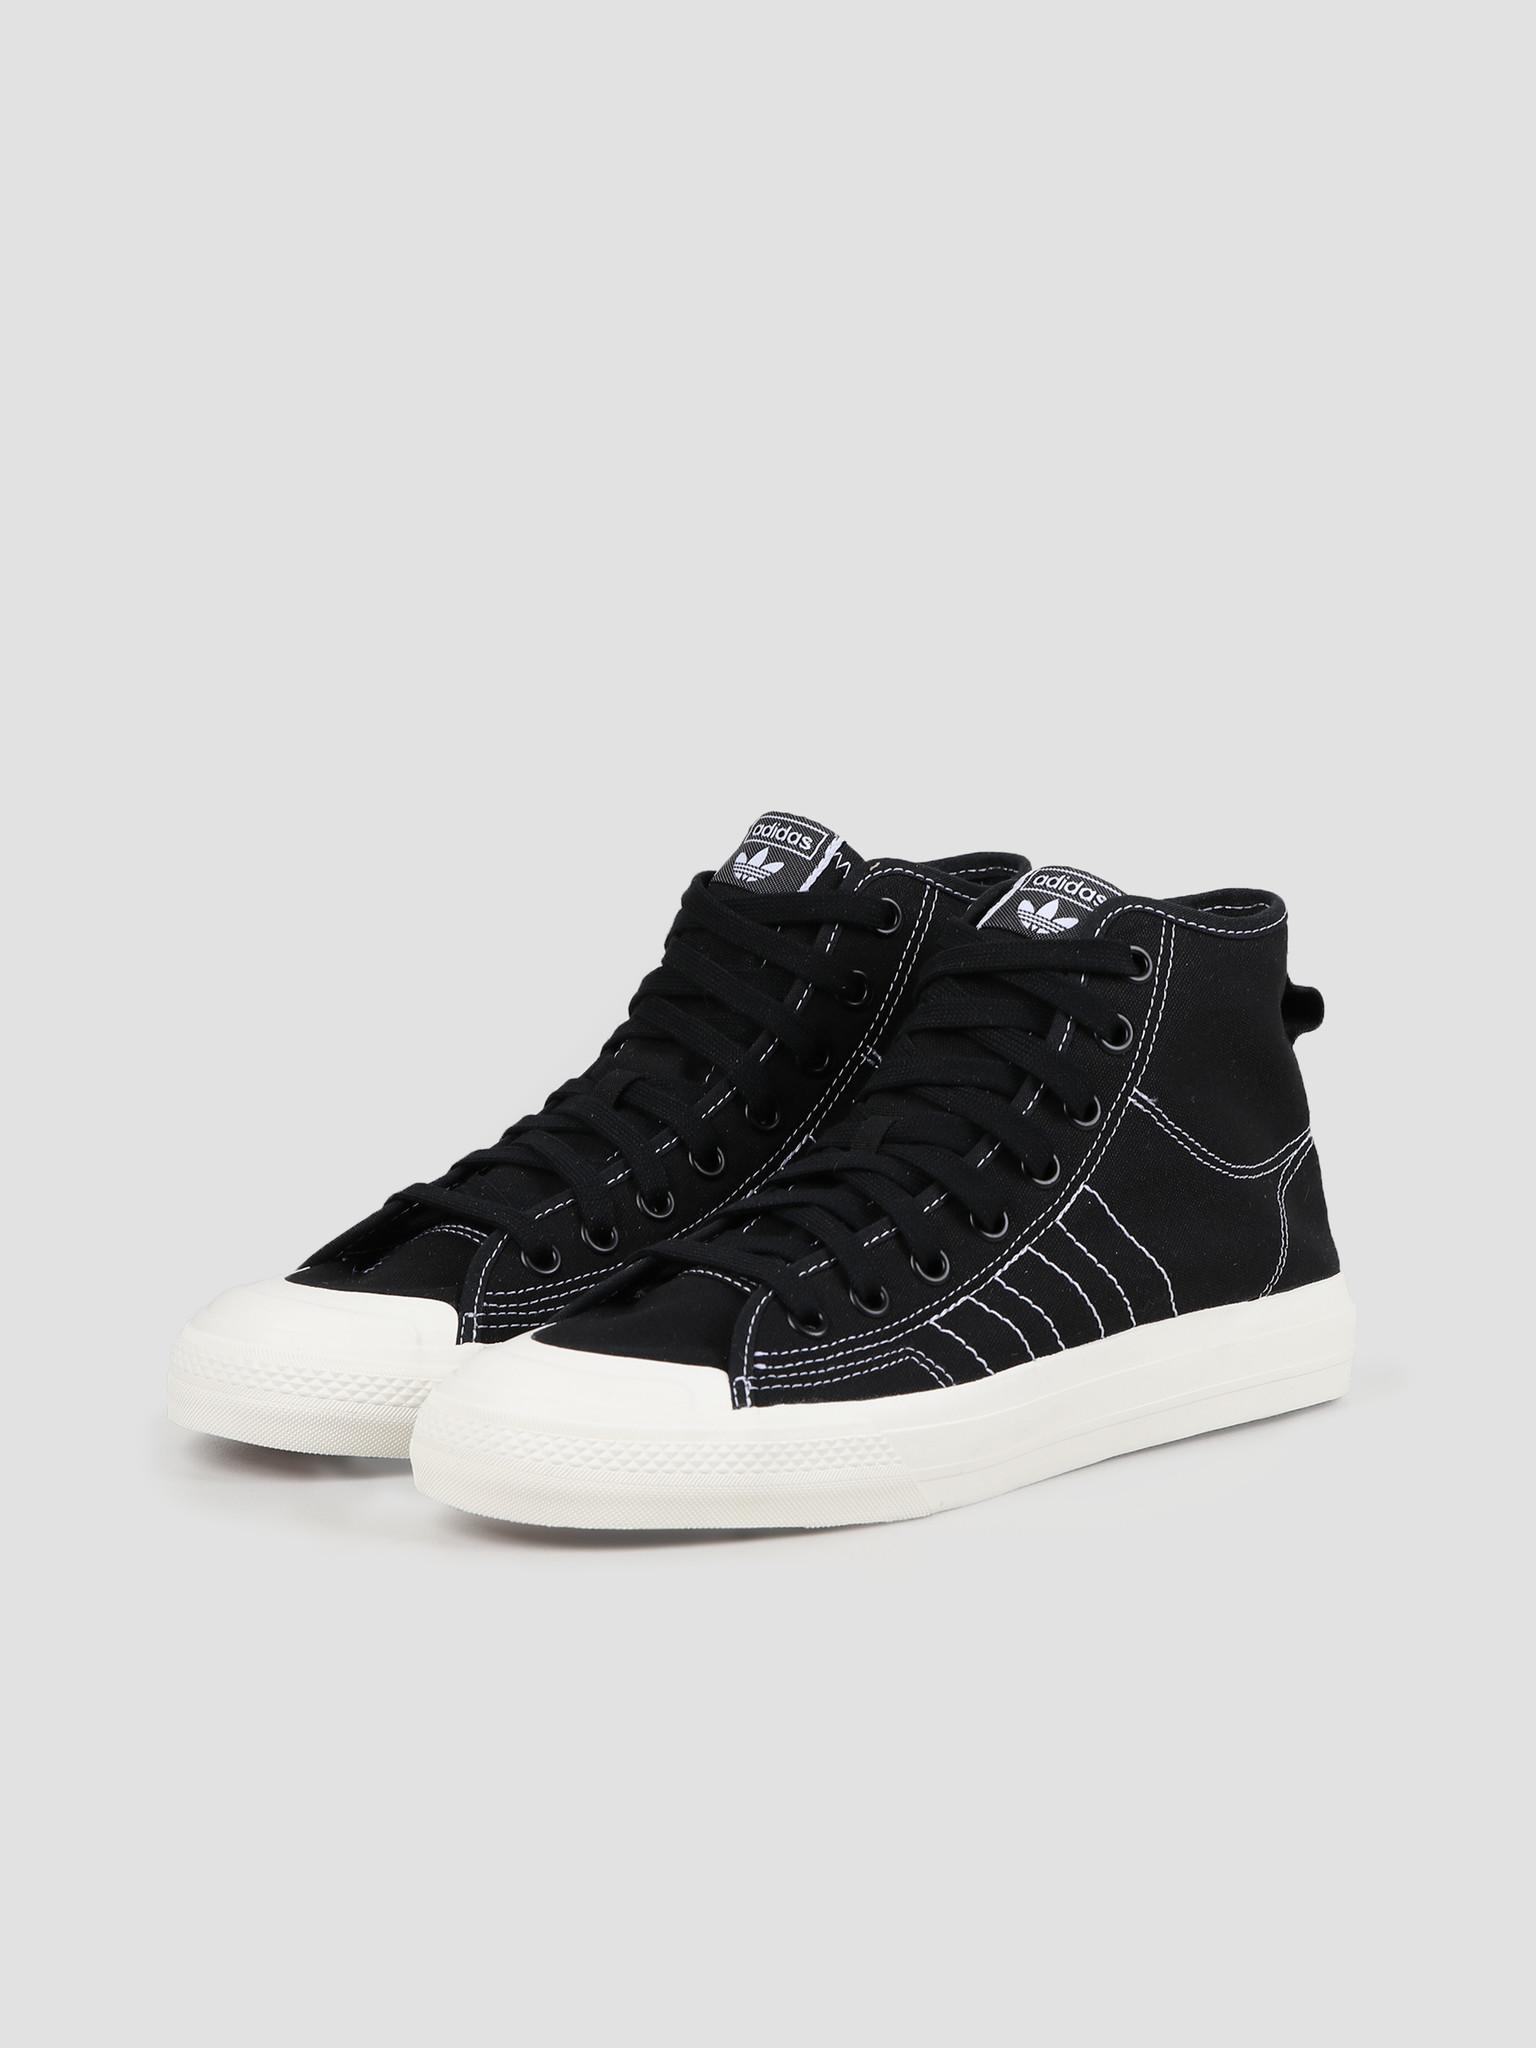 adidas adidas Nizza Hi Rf Core Black Footwear White Off White F34057